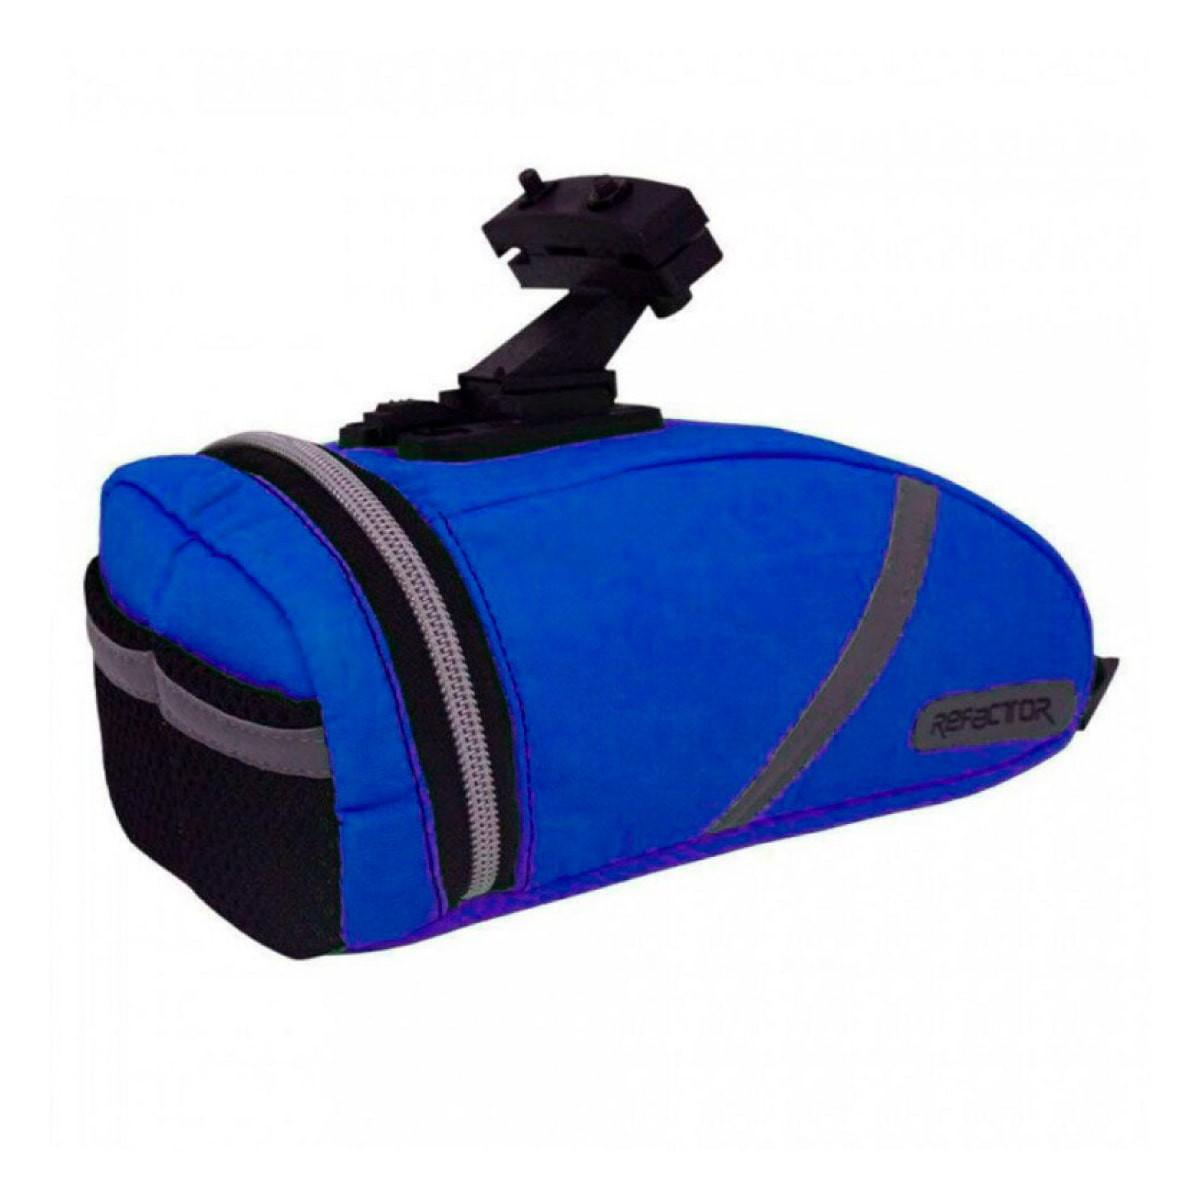 Bolsa de Selim Refactor Azul